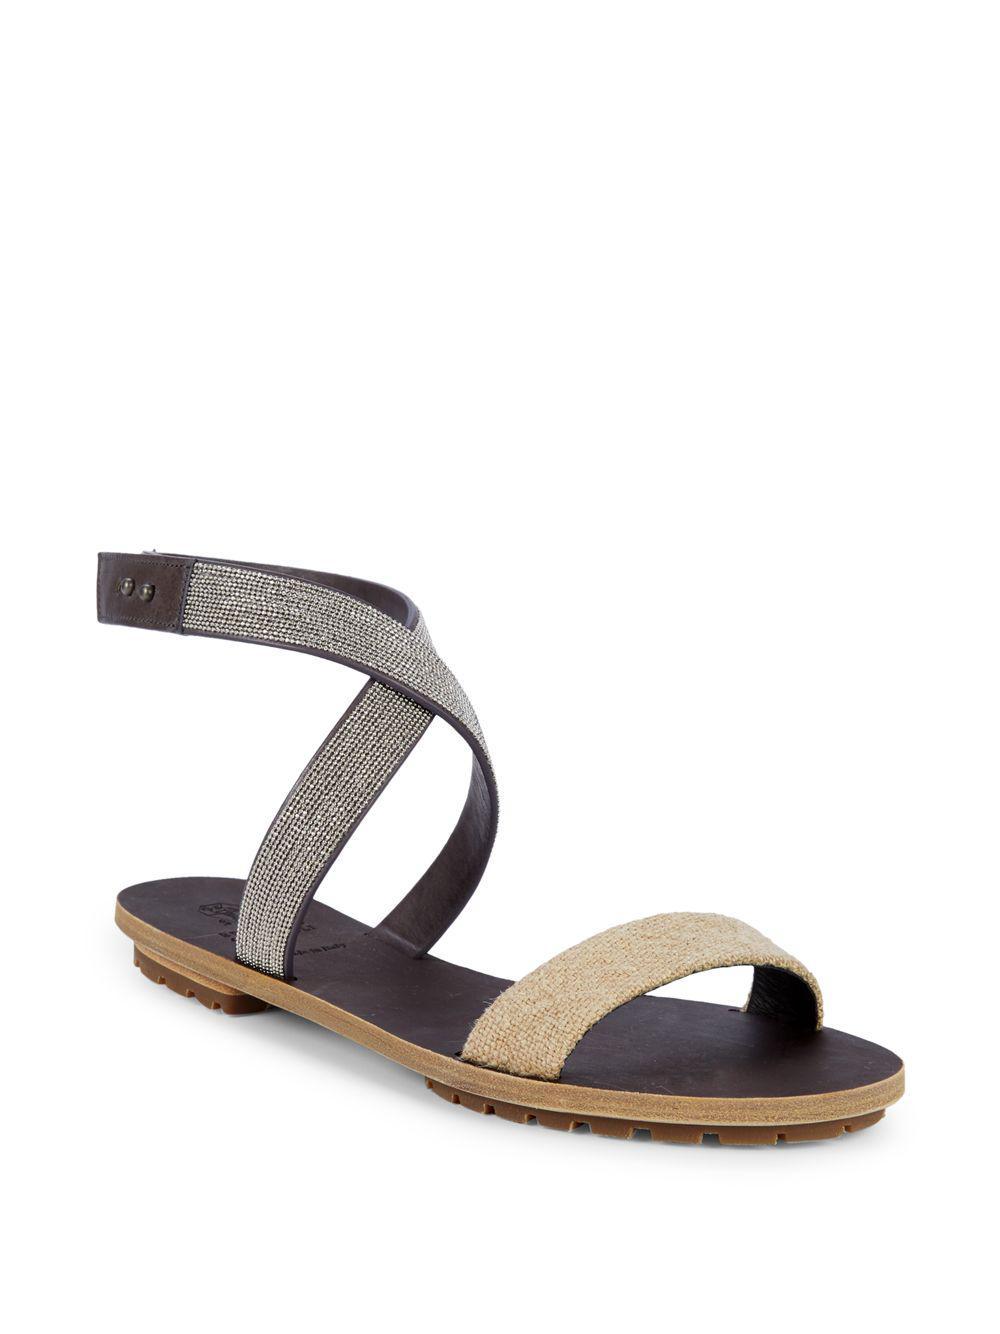 cc41bd56216 Brunello Cucinelli. Women s Textured Leather Sandals